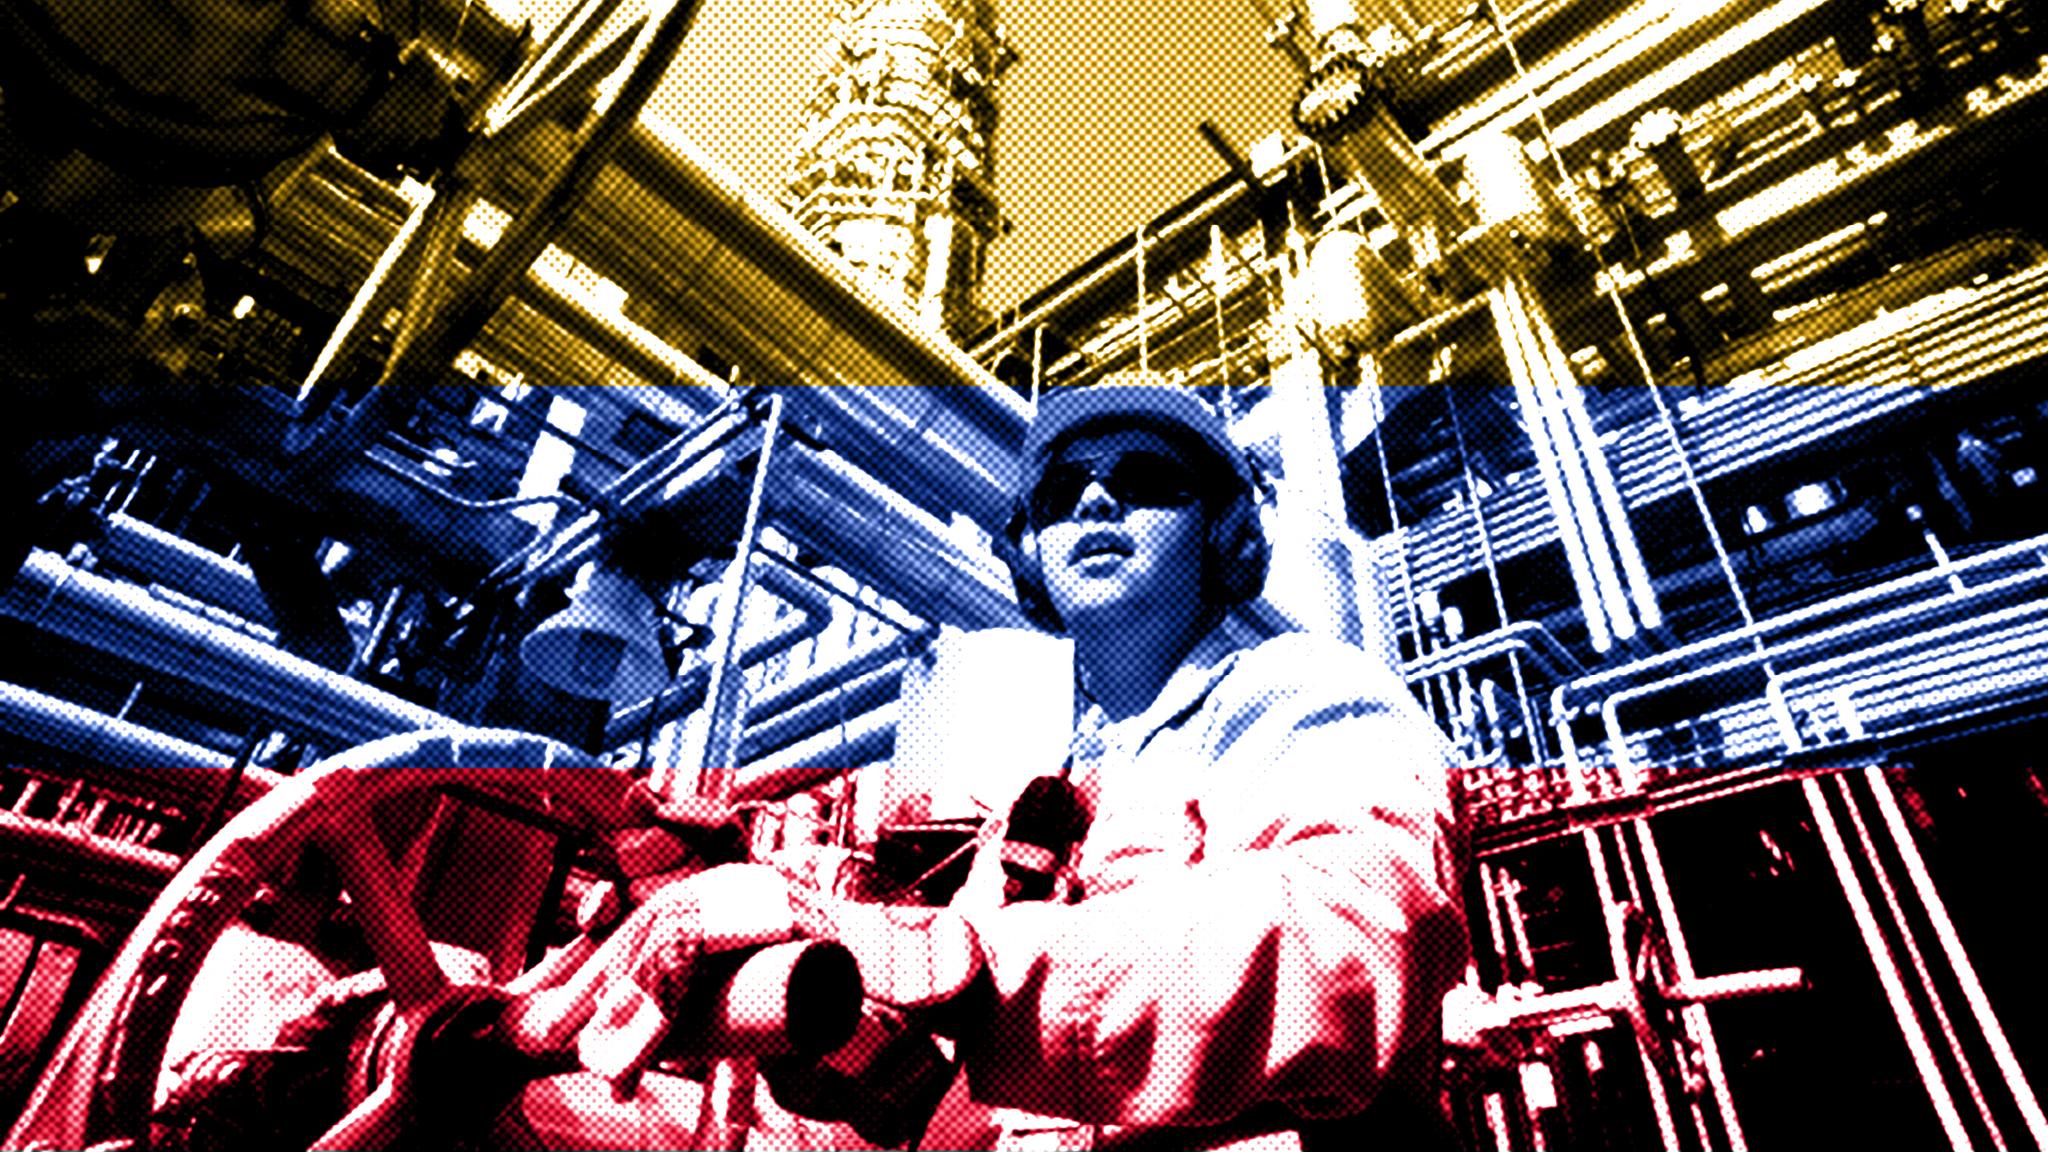 Foreign oil companies in Venezuela feel the strain